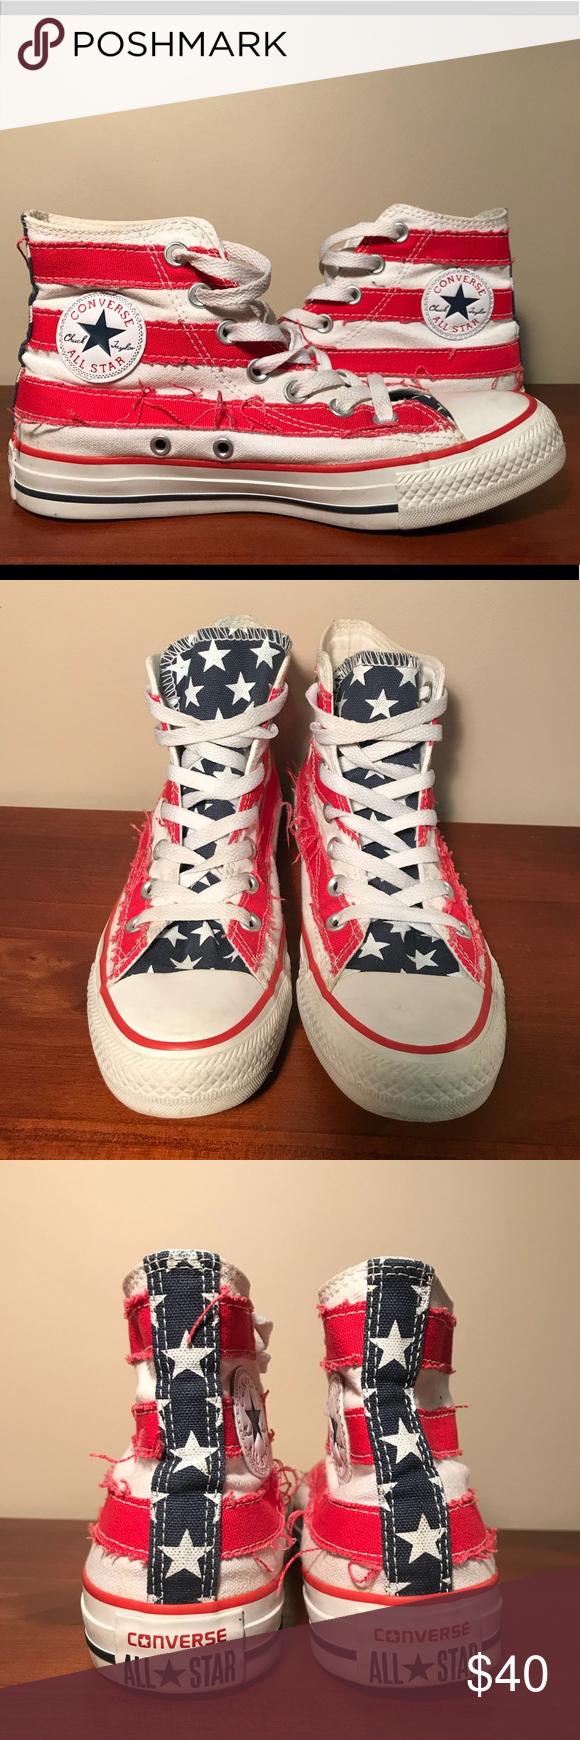 43161b4f17e0 Converse Chuck Taylor Americana High Tops 4M 6W Unisex American Flag Chuck  Taylor All Stars